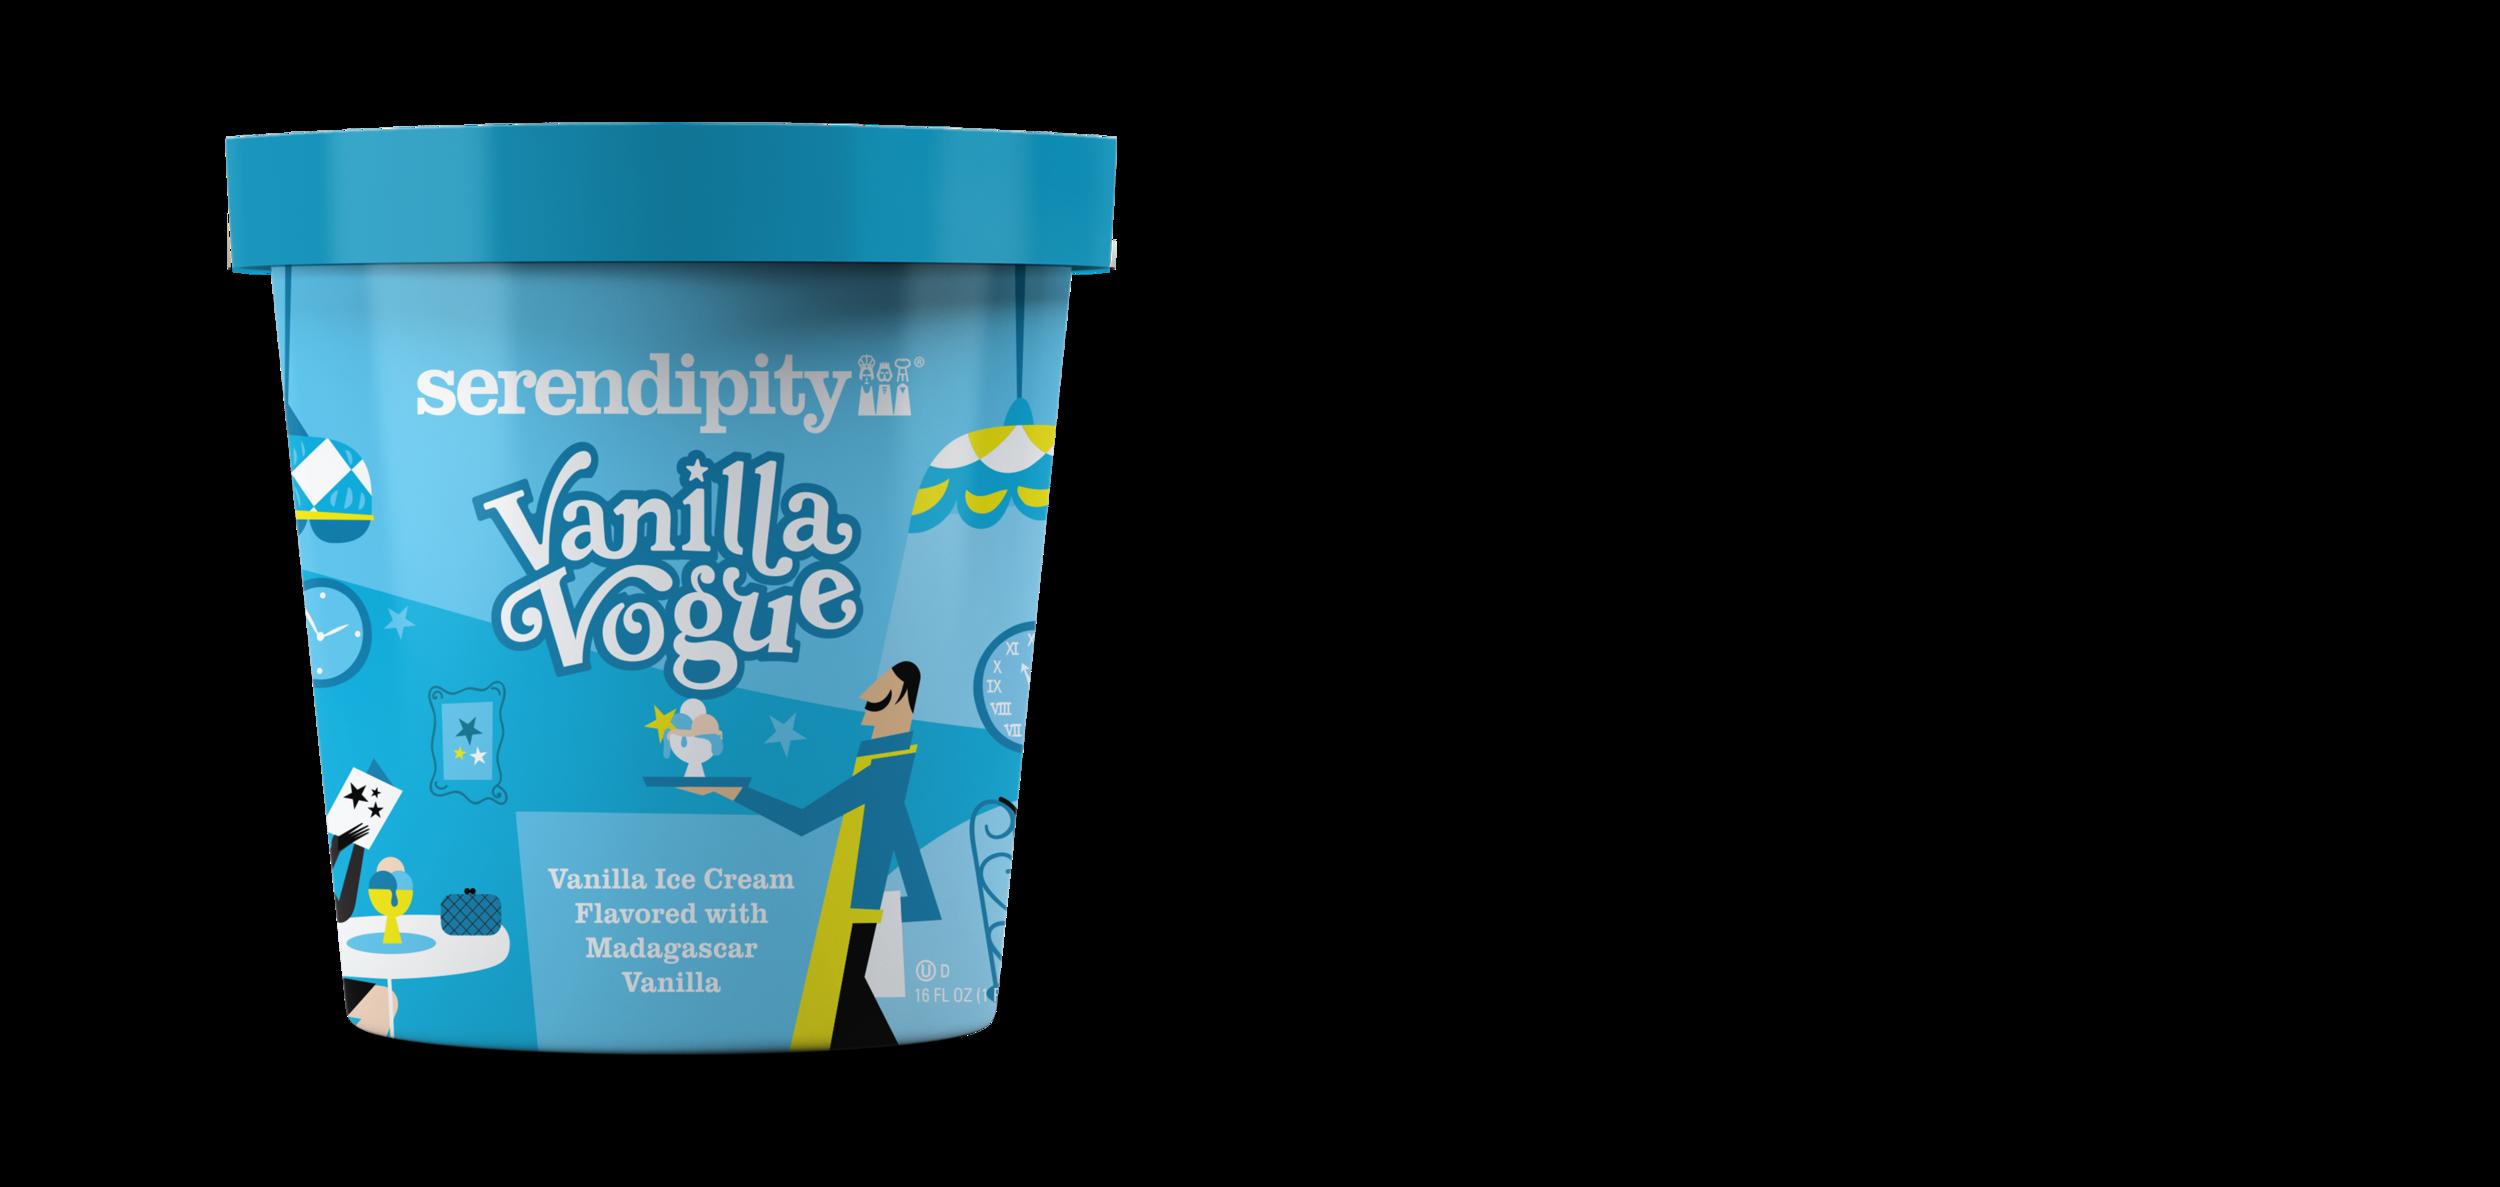 Vanilla Vogue - Vanilla Ice Cream Flavored with Madagascar Vanilla